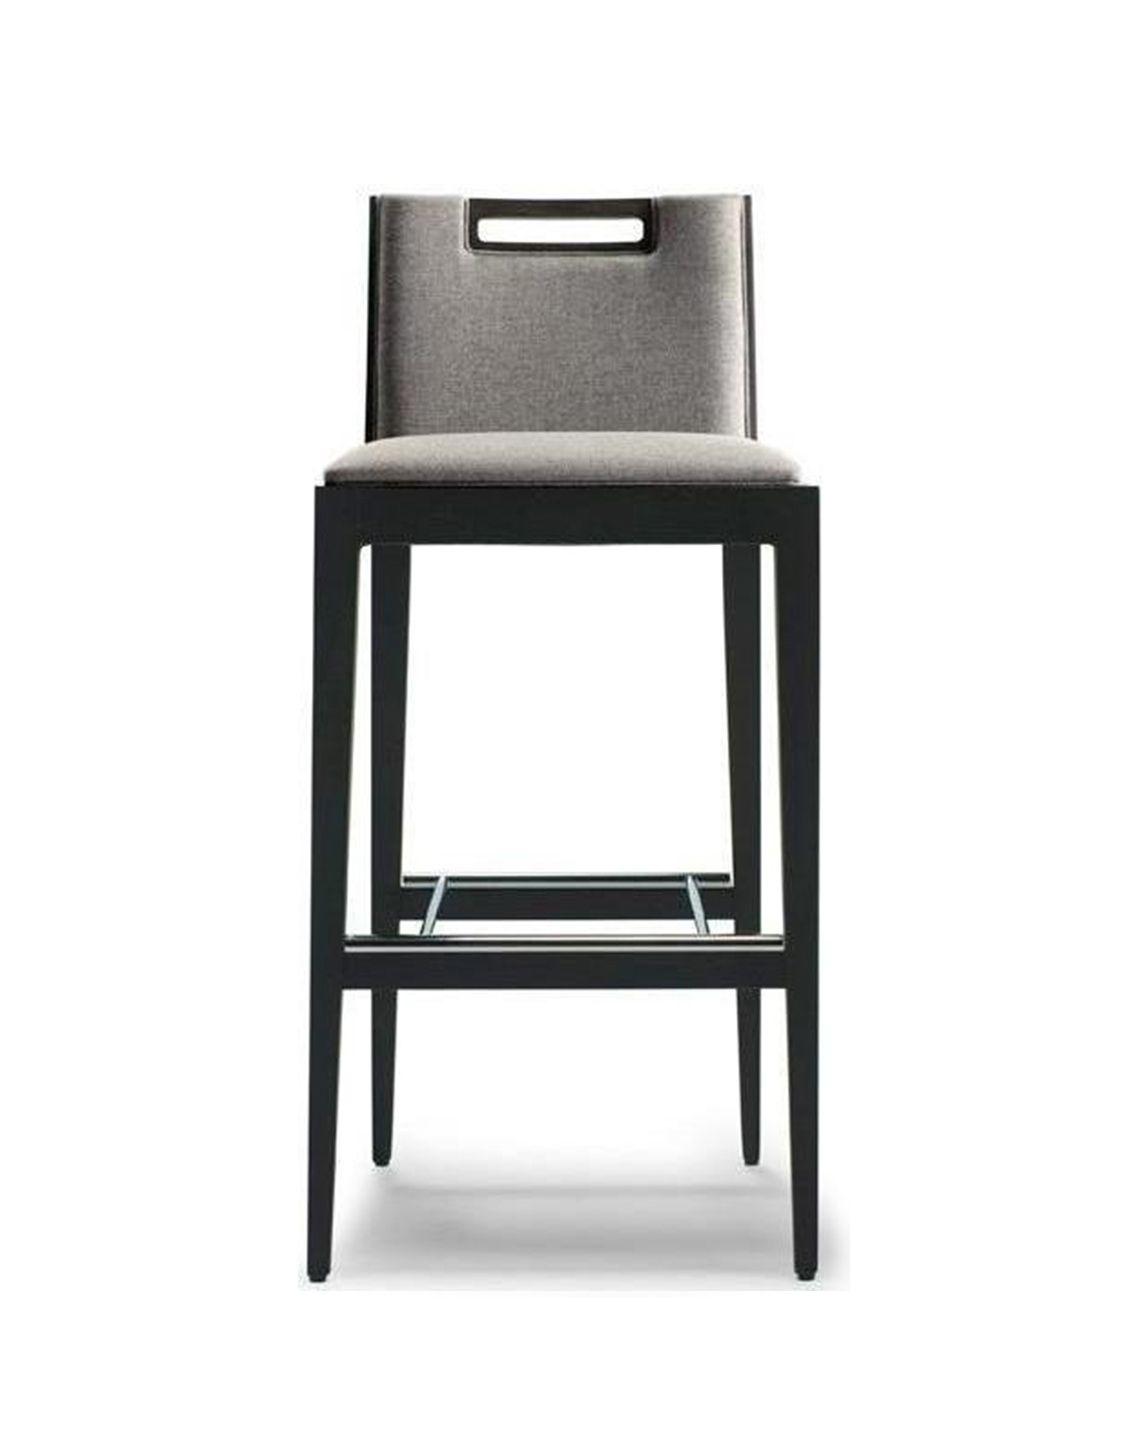 elips2051barstool  banco de madera  Sillas de bar